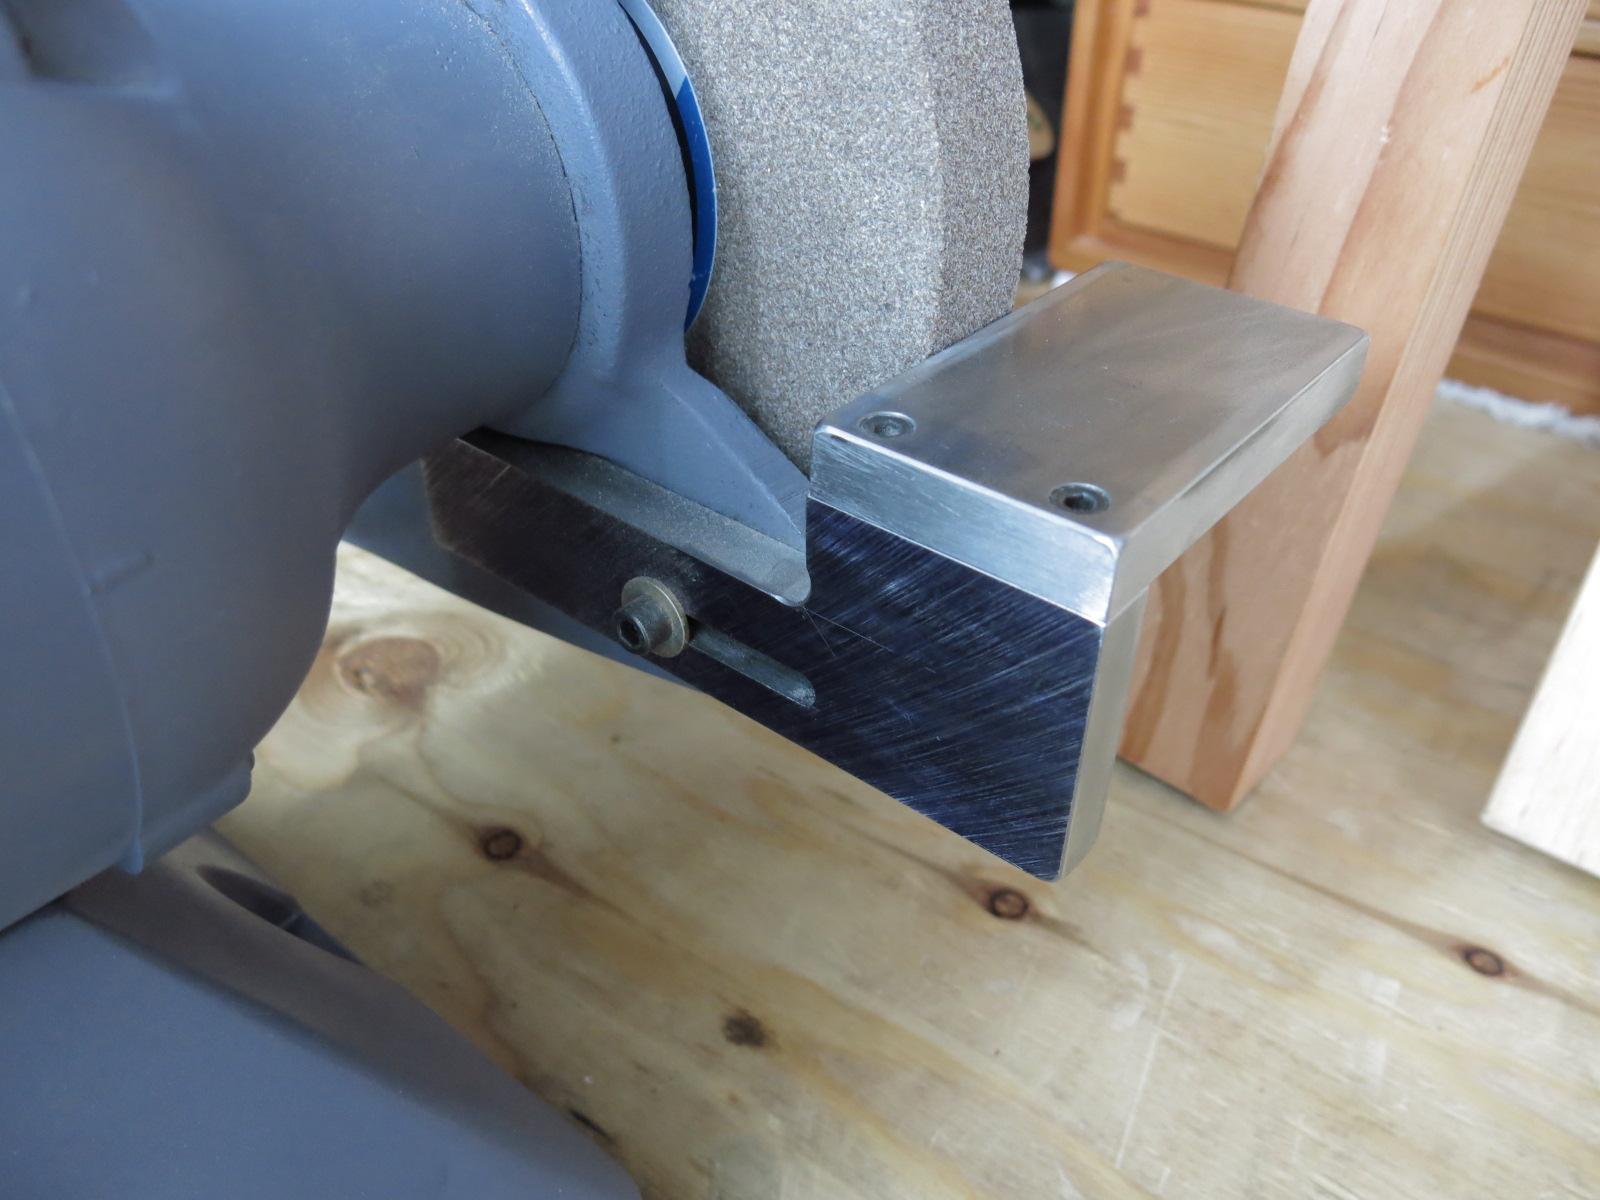 Prime Aerialcopper Refined Baldor 7 Inch Bench Grinder Inzonedesignstudio Interior Chair Design Inzonedesignstudiocom